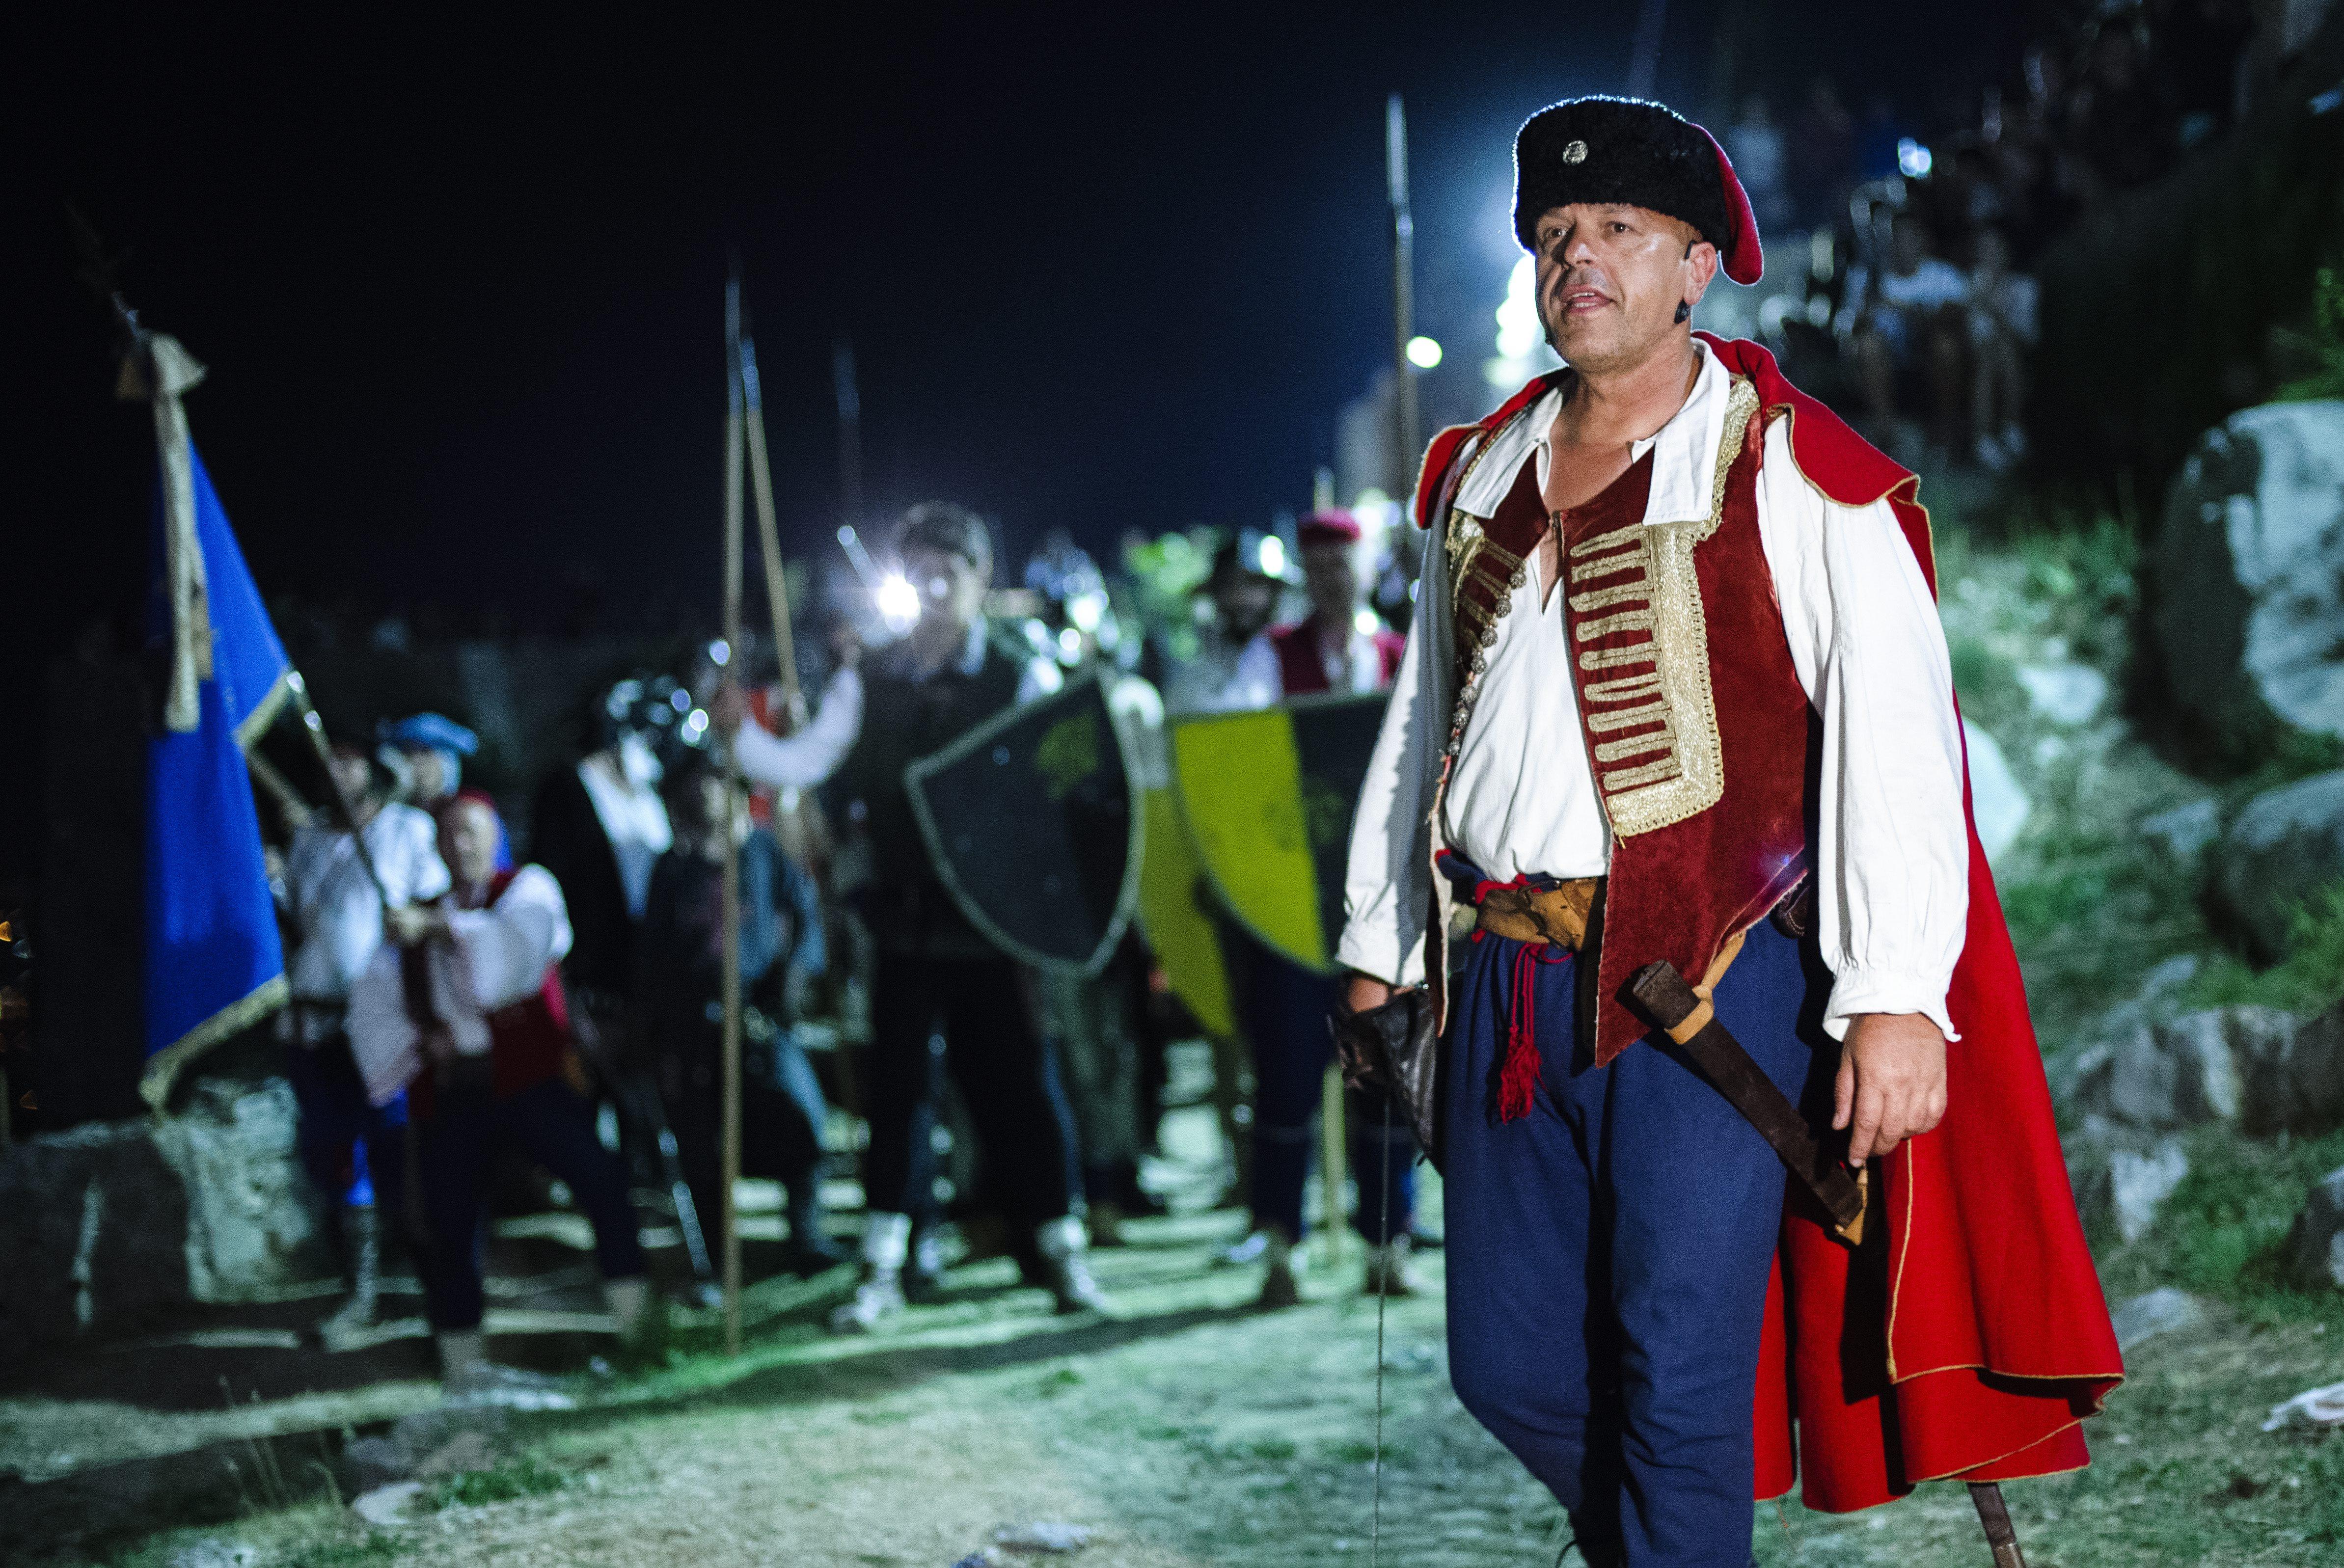 Battle of Klis Live Action, warriors, costumes